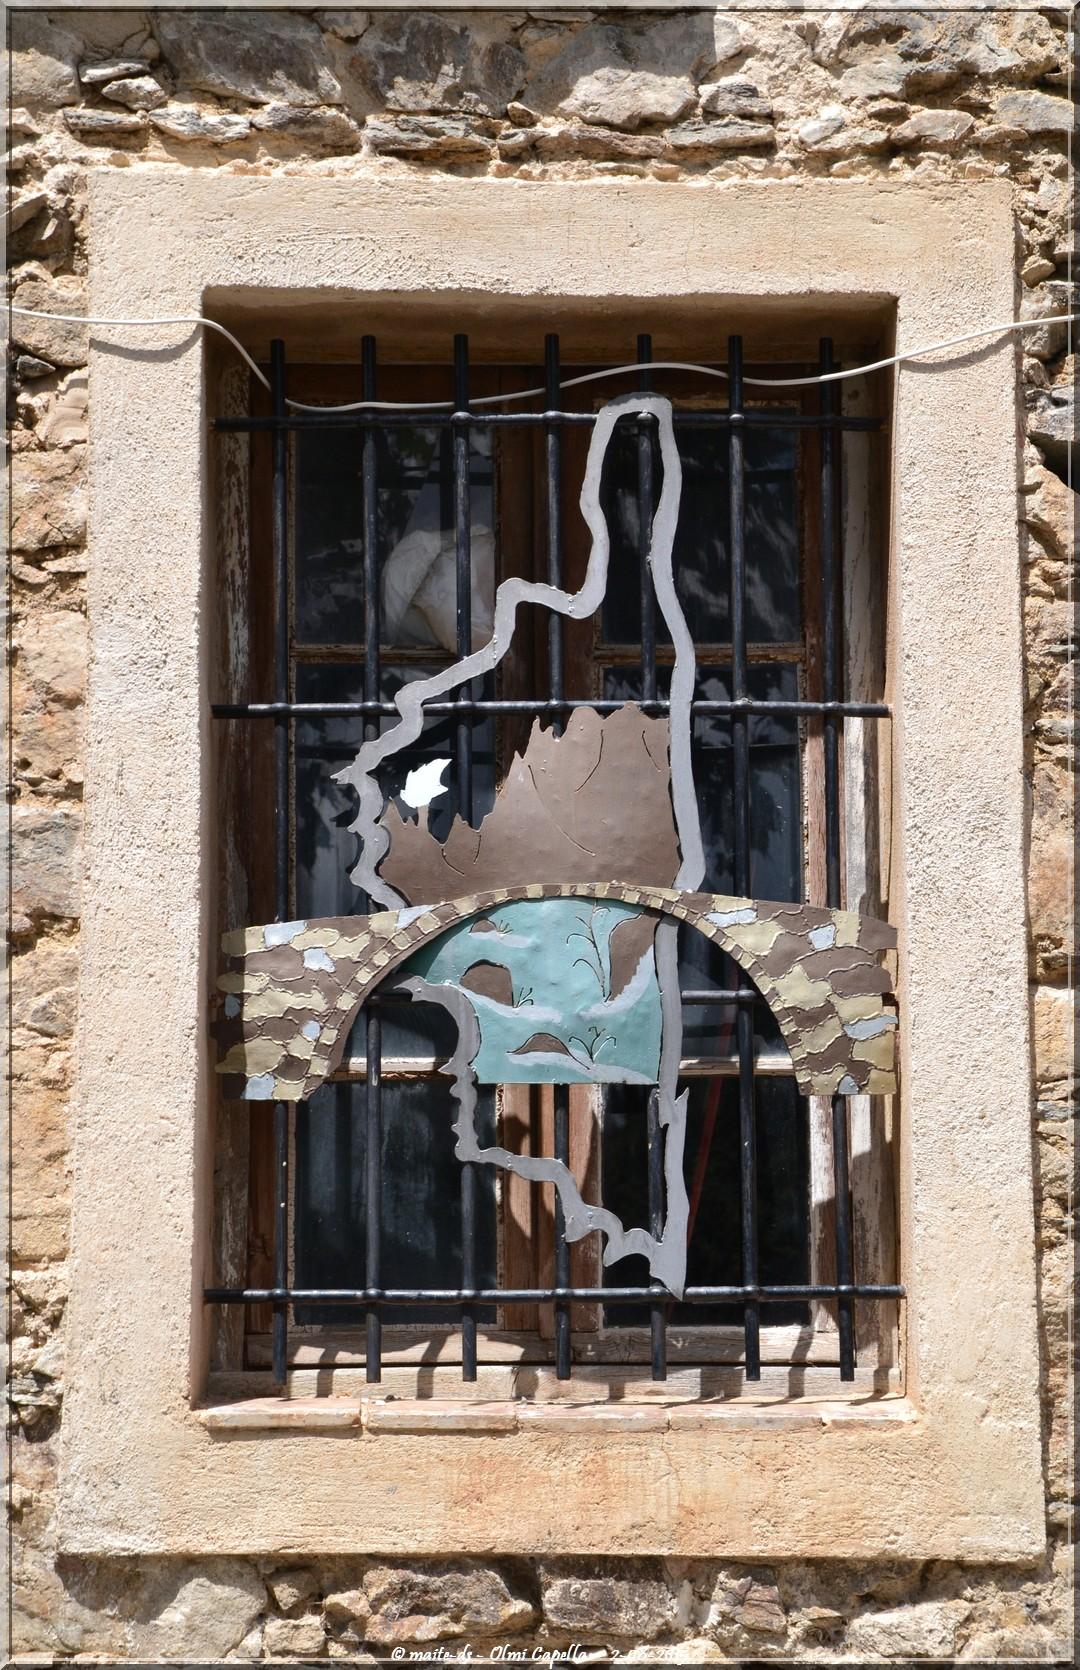 Une jolie façade - Olmi Capella - Corse